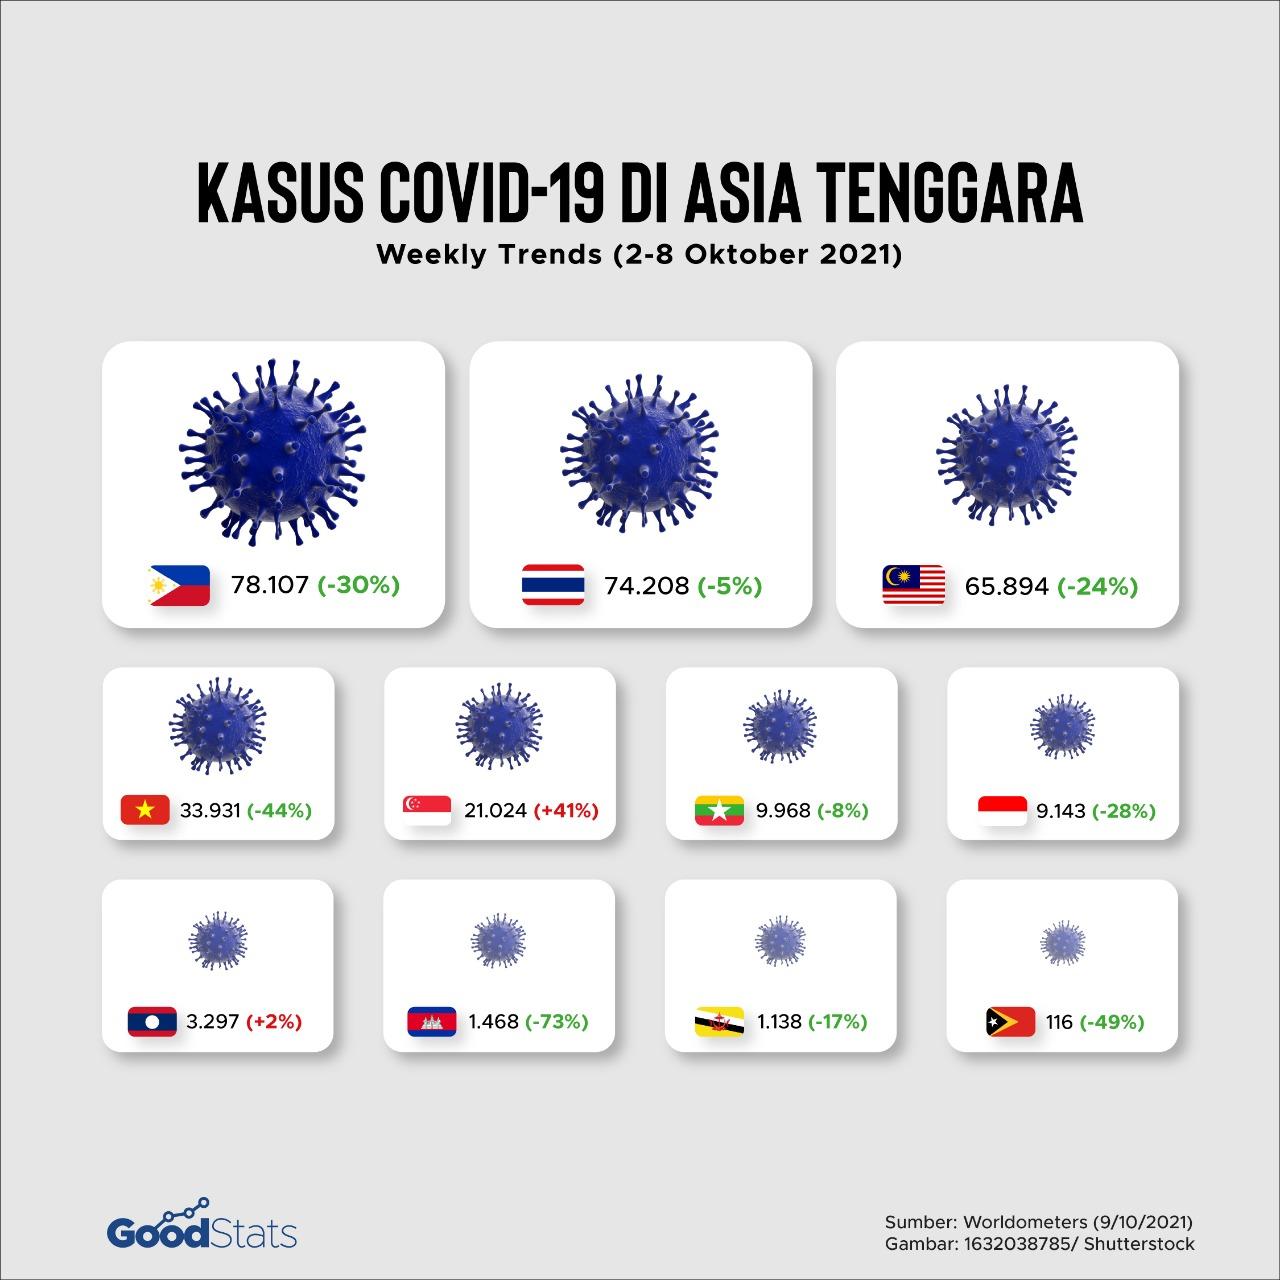 Tercatat 9 dari 11 negara Asia Tenggara mengalami penurunan kasus mingguan Covid-19 dalam sepekan terakhir (2-8 Oktober 2021).   GoodStats